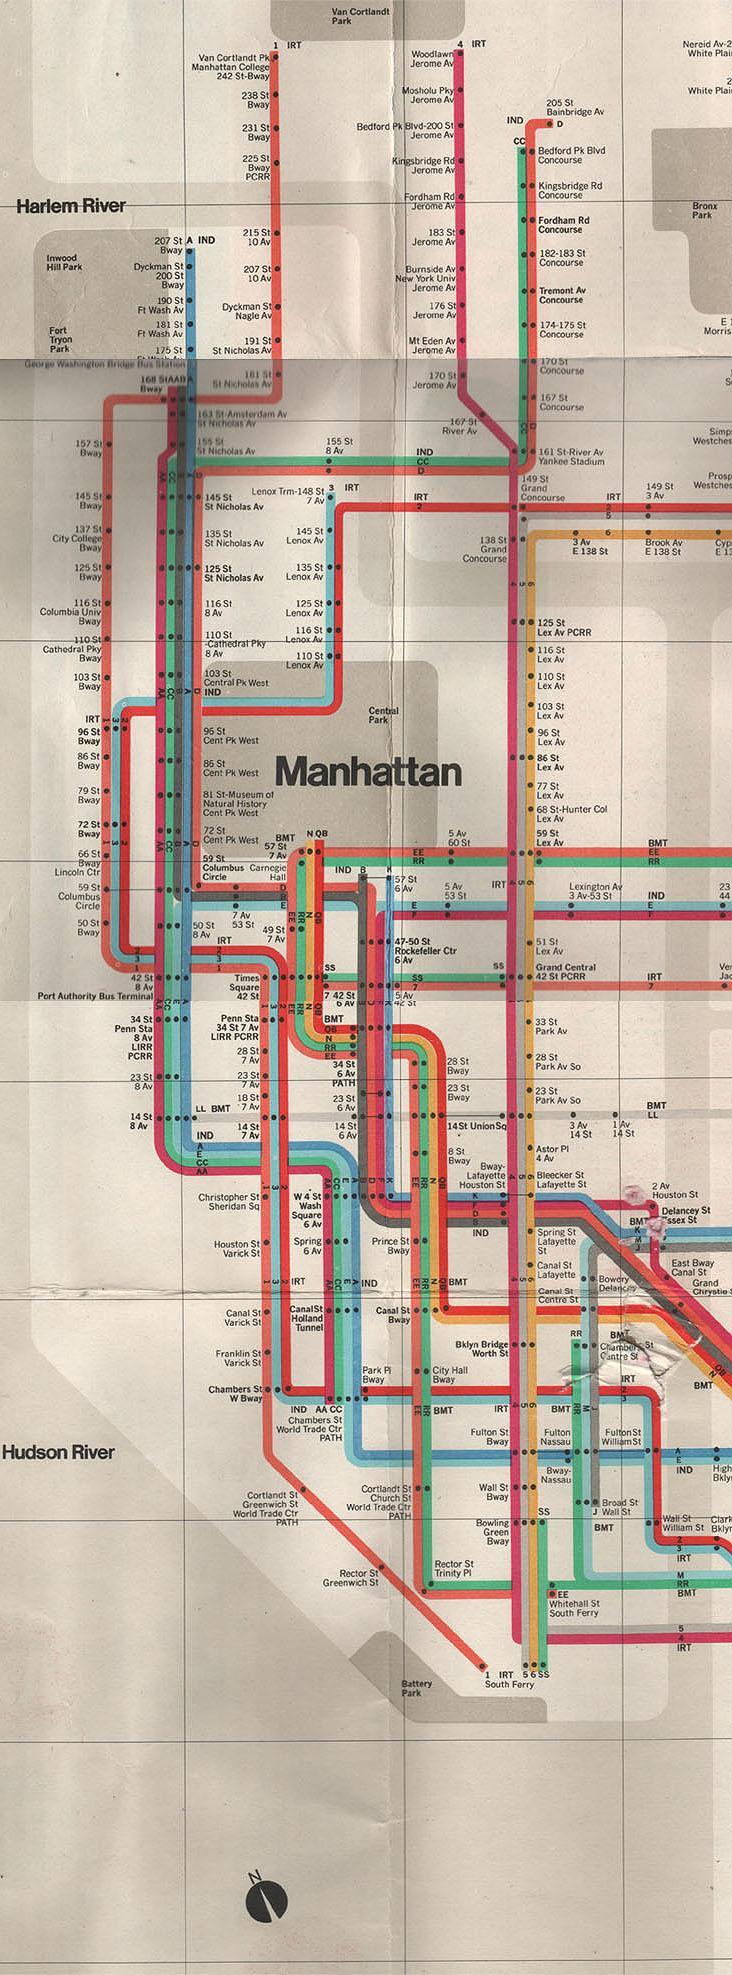 Detailed subway map of Manhattan Maps of